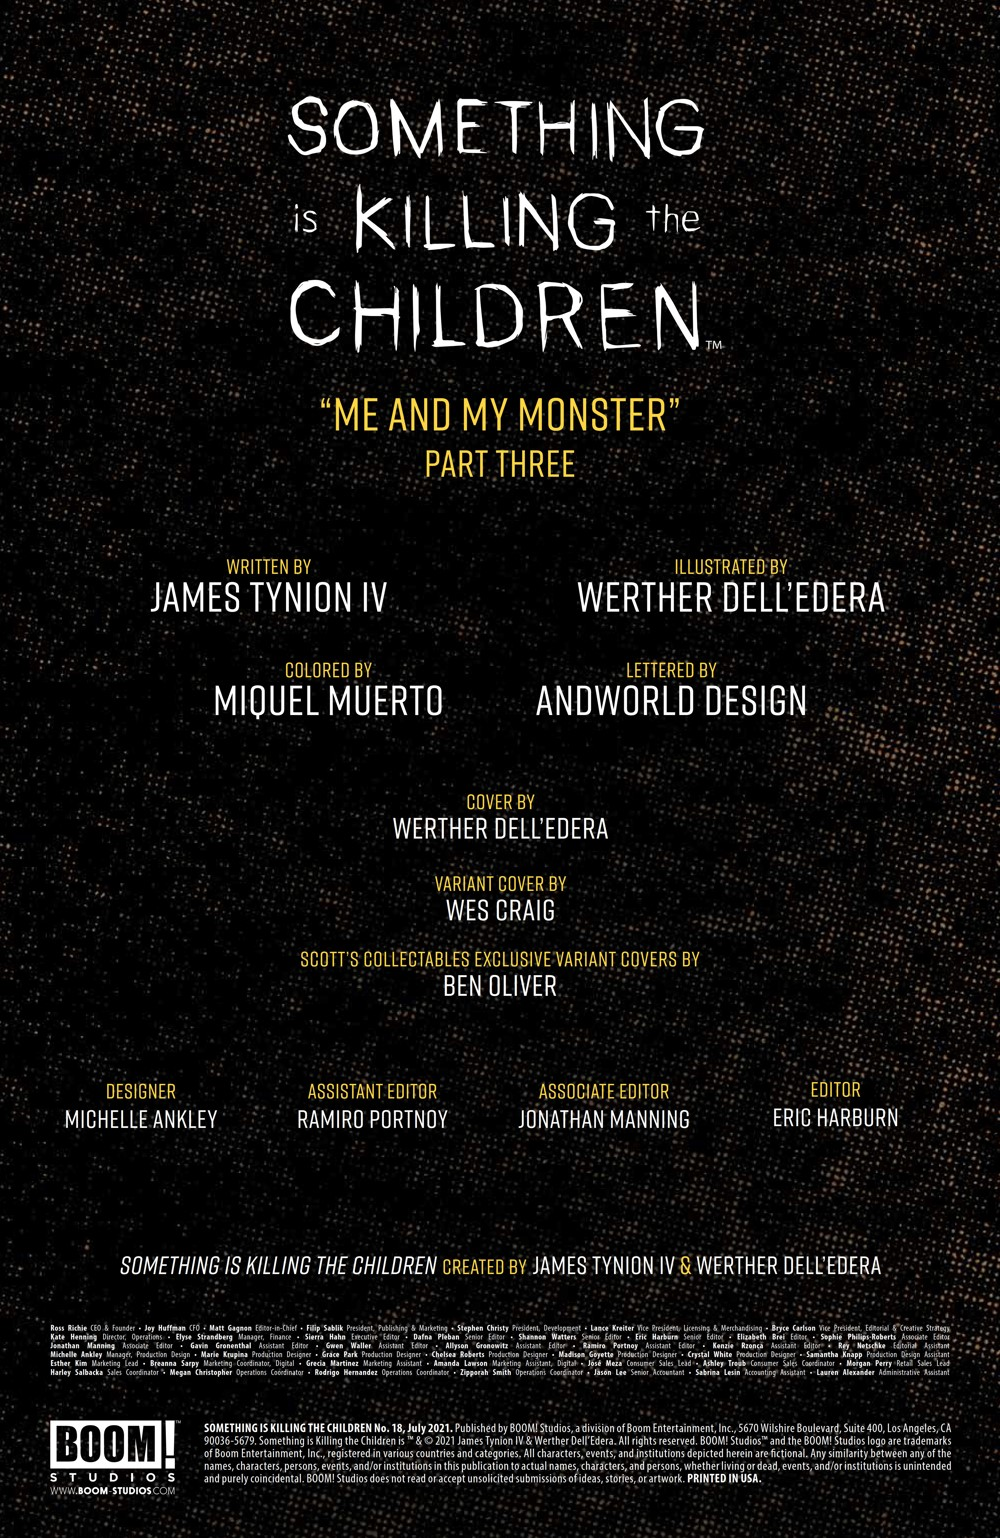 SomethingKillingChildren_018_PRESS_29 ComicList Previews: SOMETHING IS KILLING THE CHILDREN #18